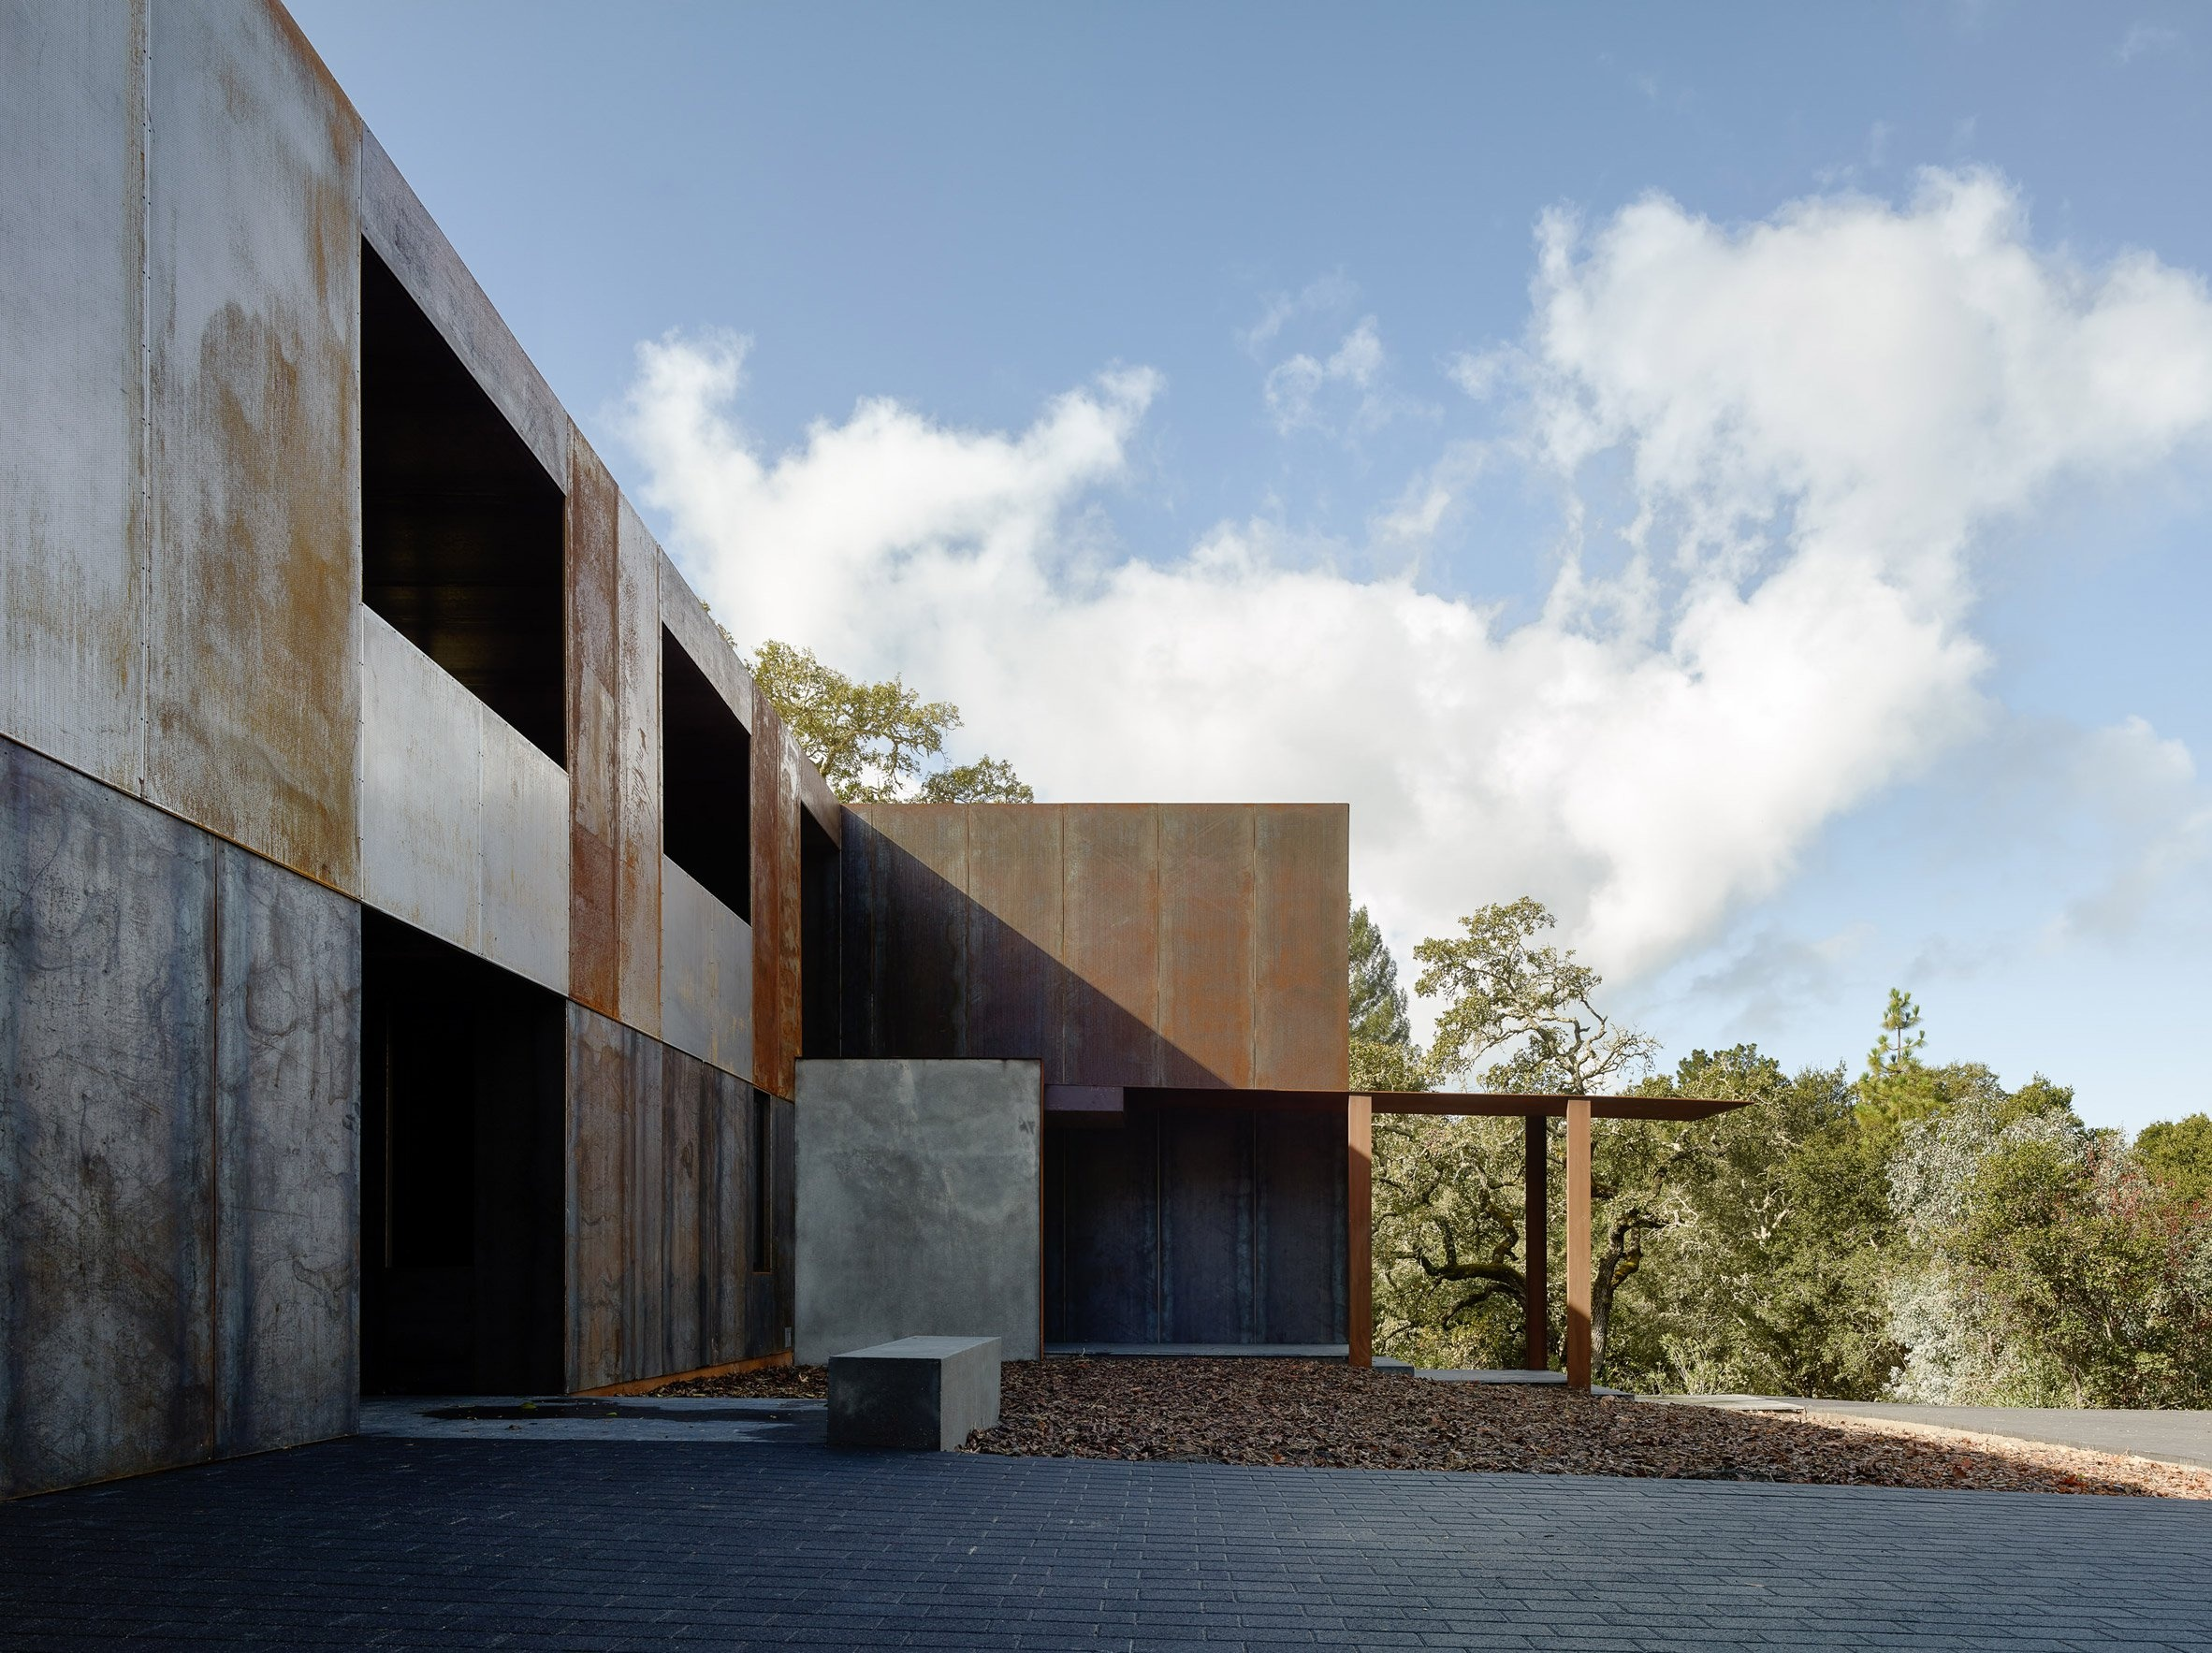 miner-road-faulkner-architects_dezeen_2364_col_9